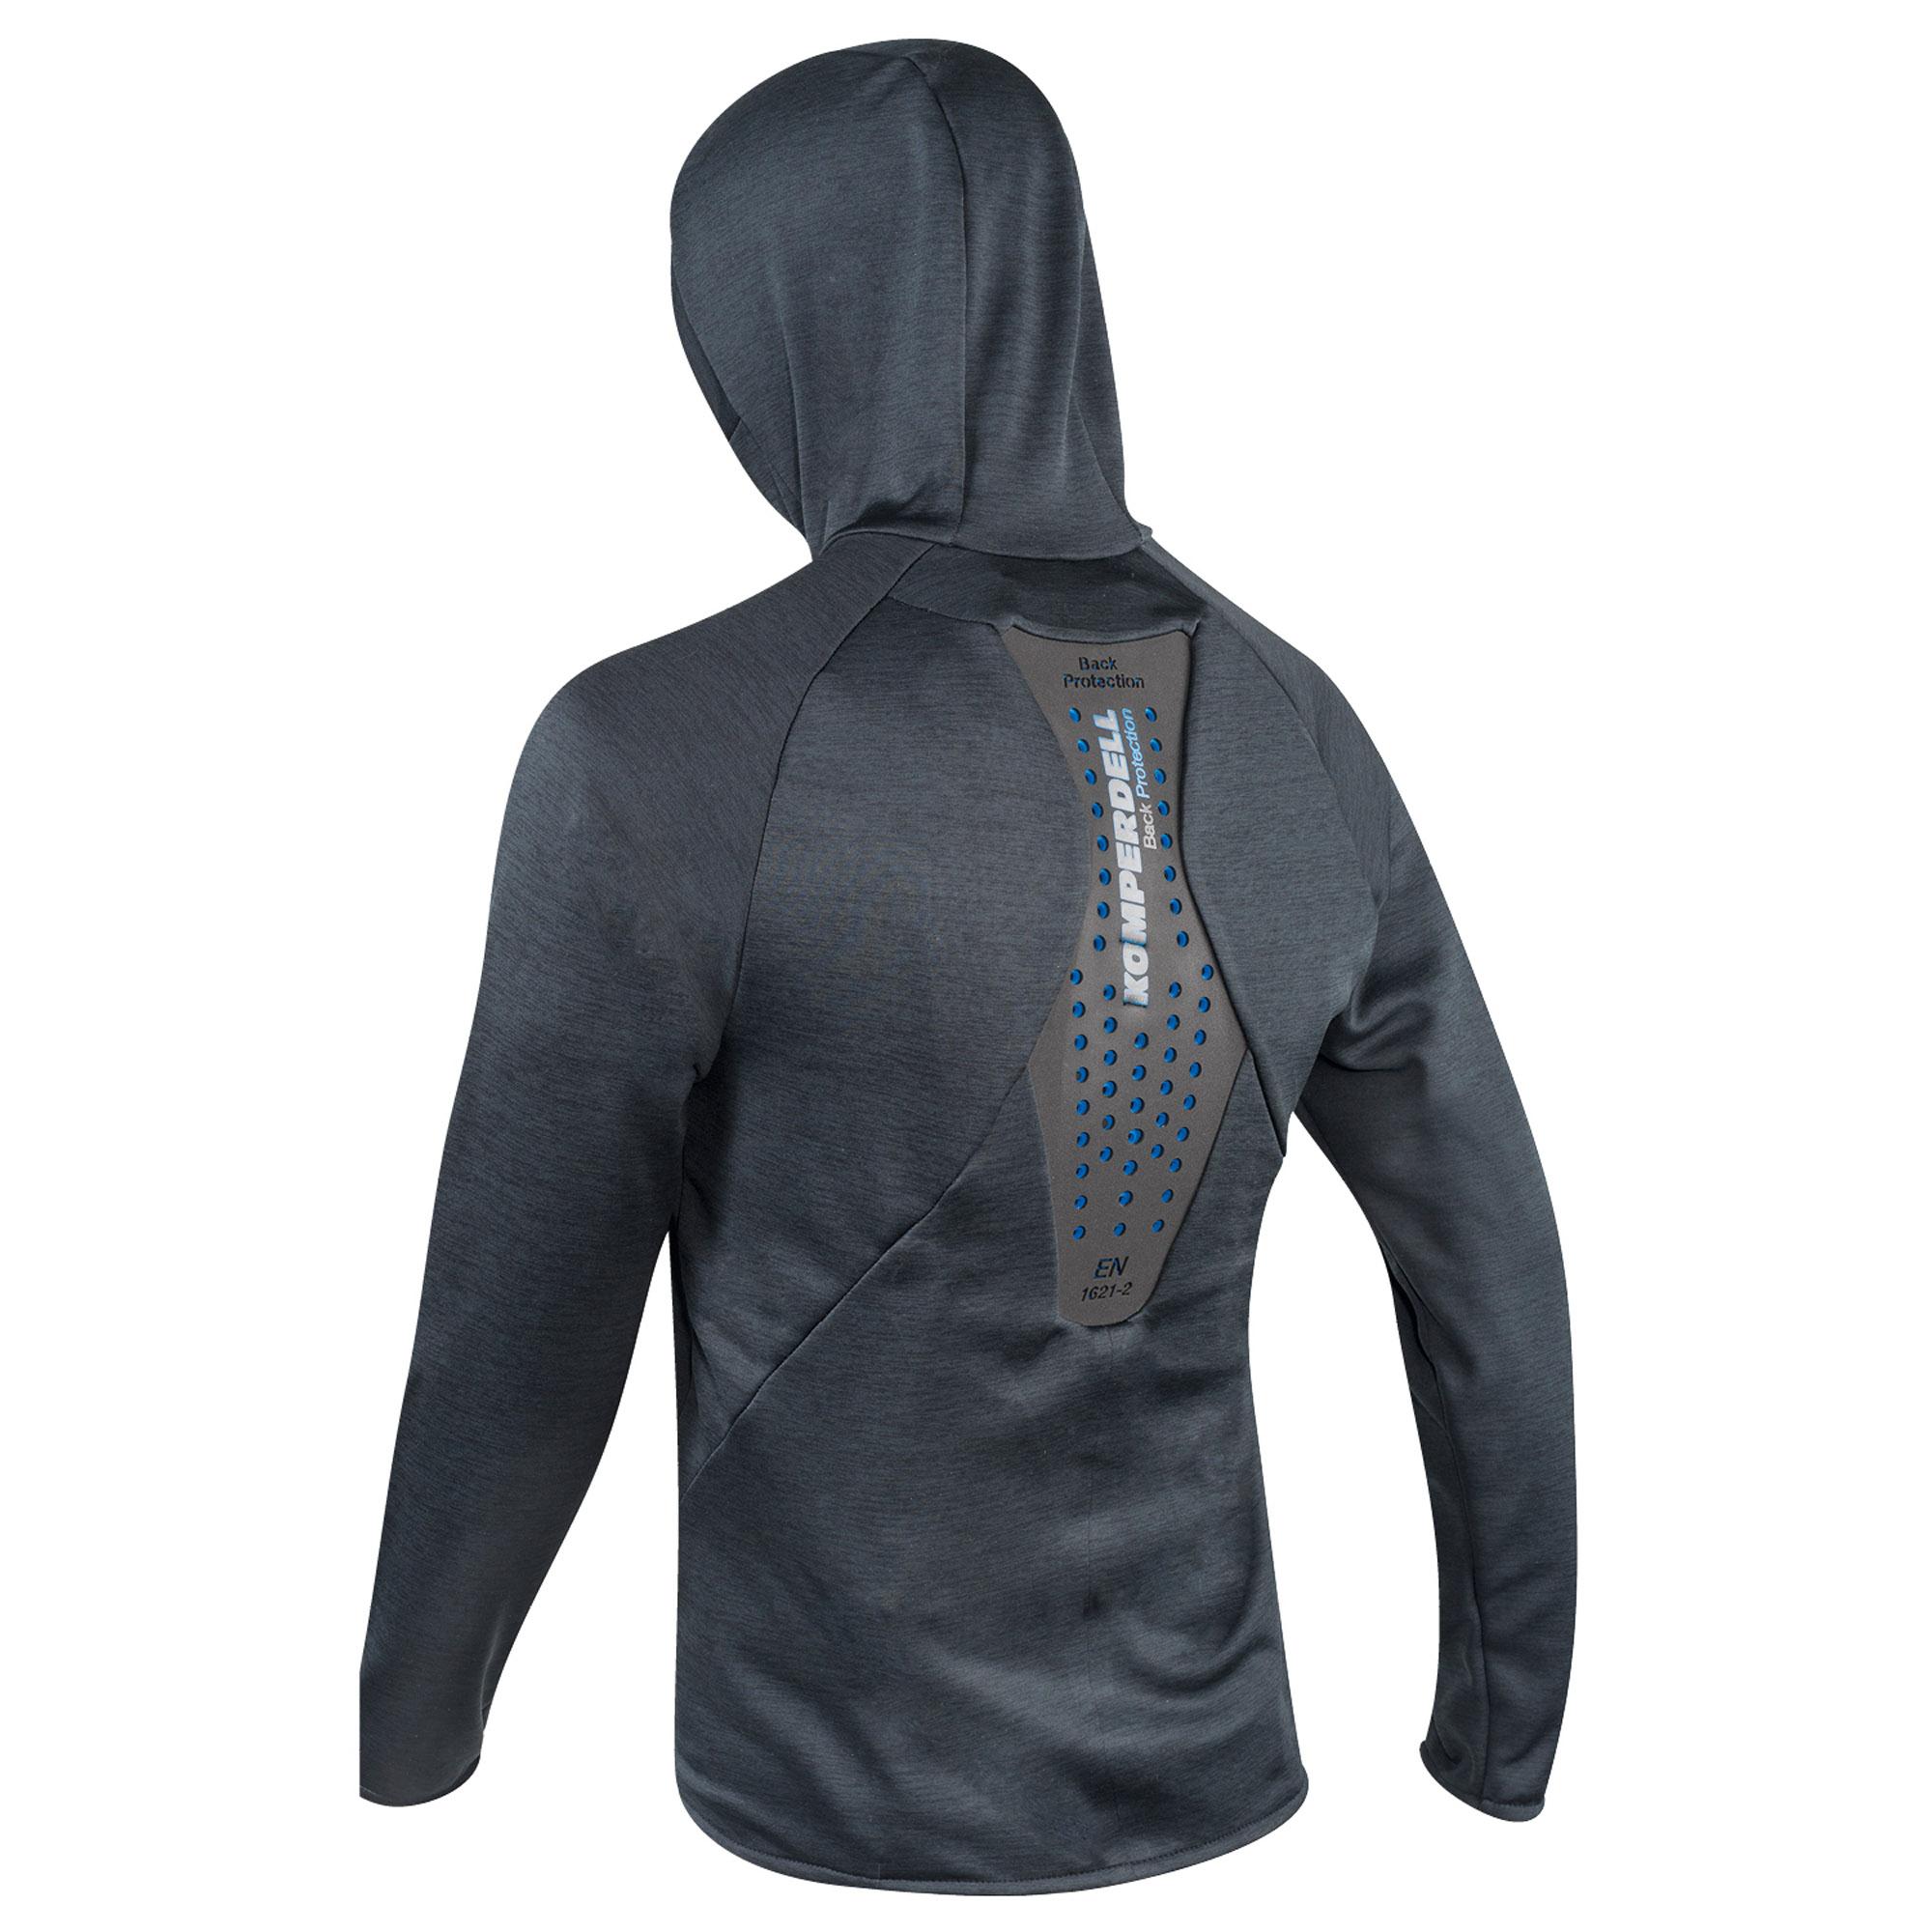 Full Zip Hoody Shirt Men